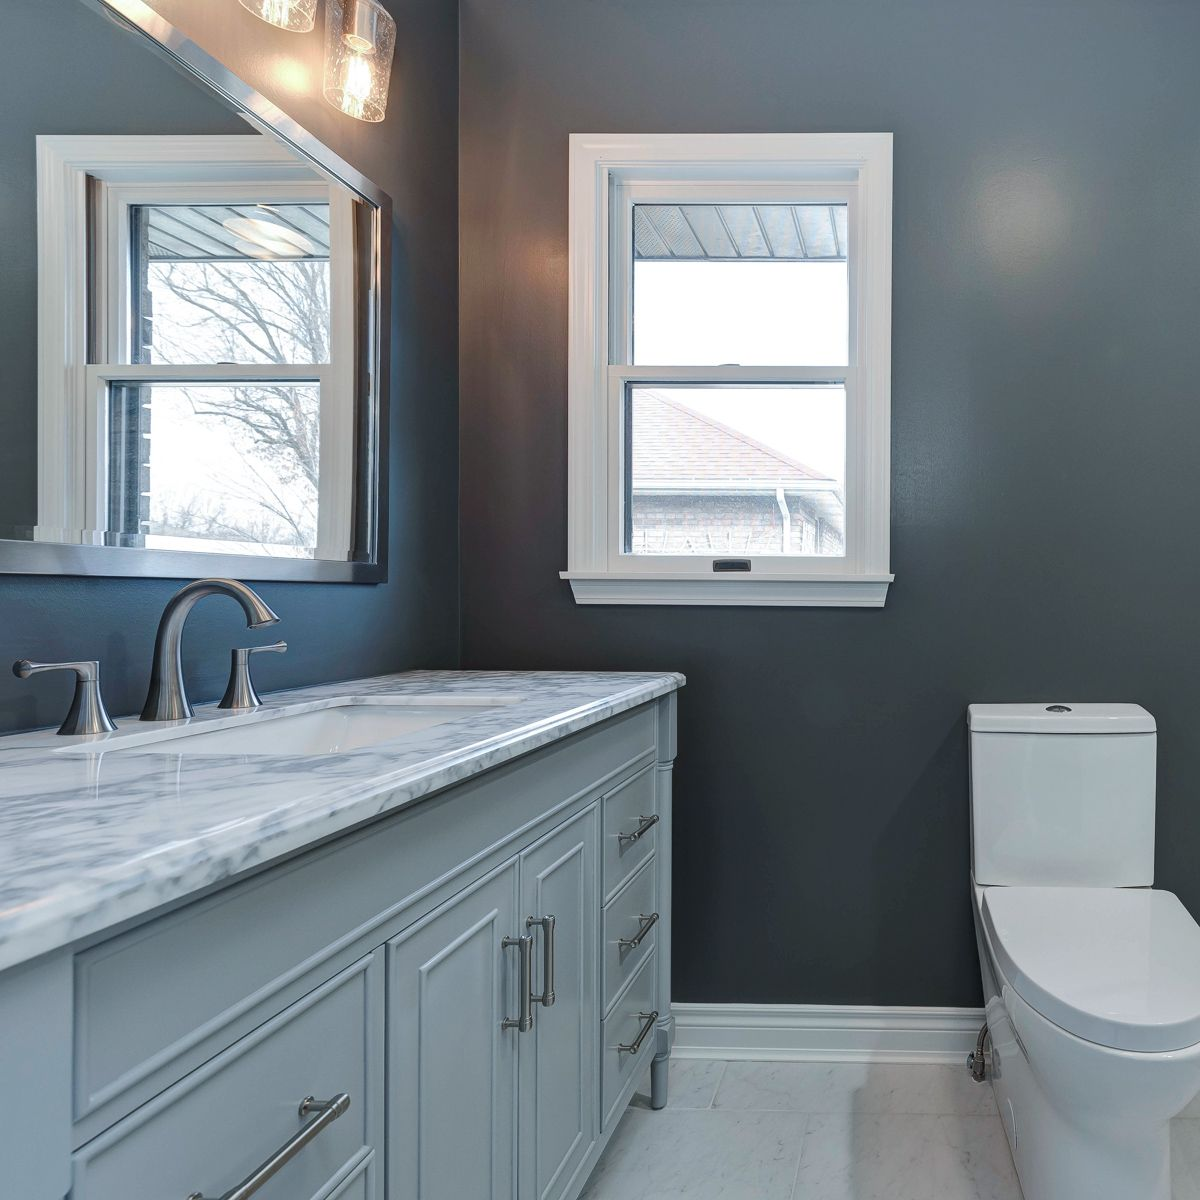 From Old To Updated Bathroom Remodel Bathroom Wall Tile Trendy Bathroom Tiles Amazing Bathrooms